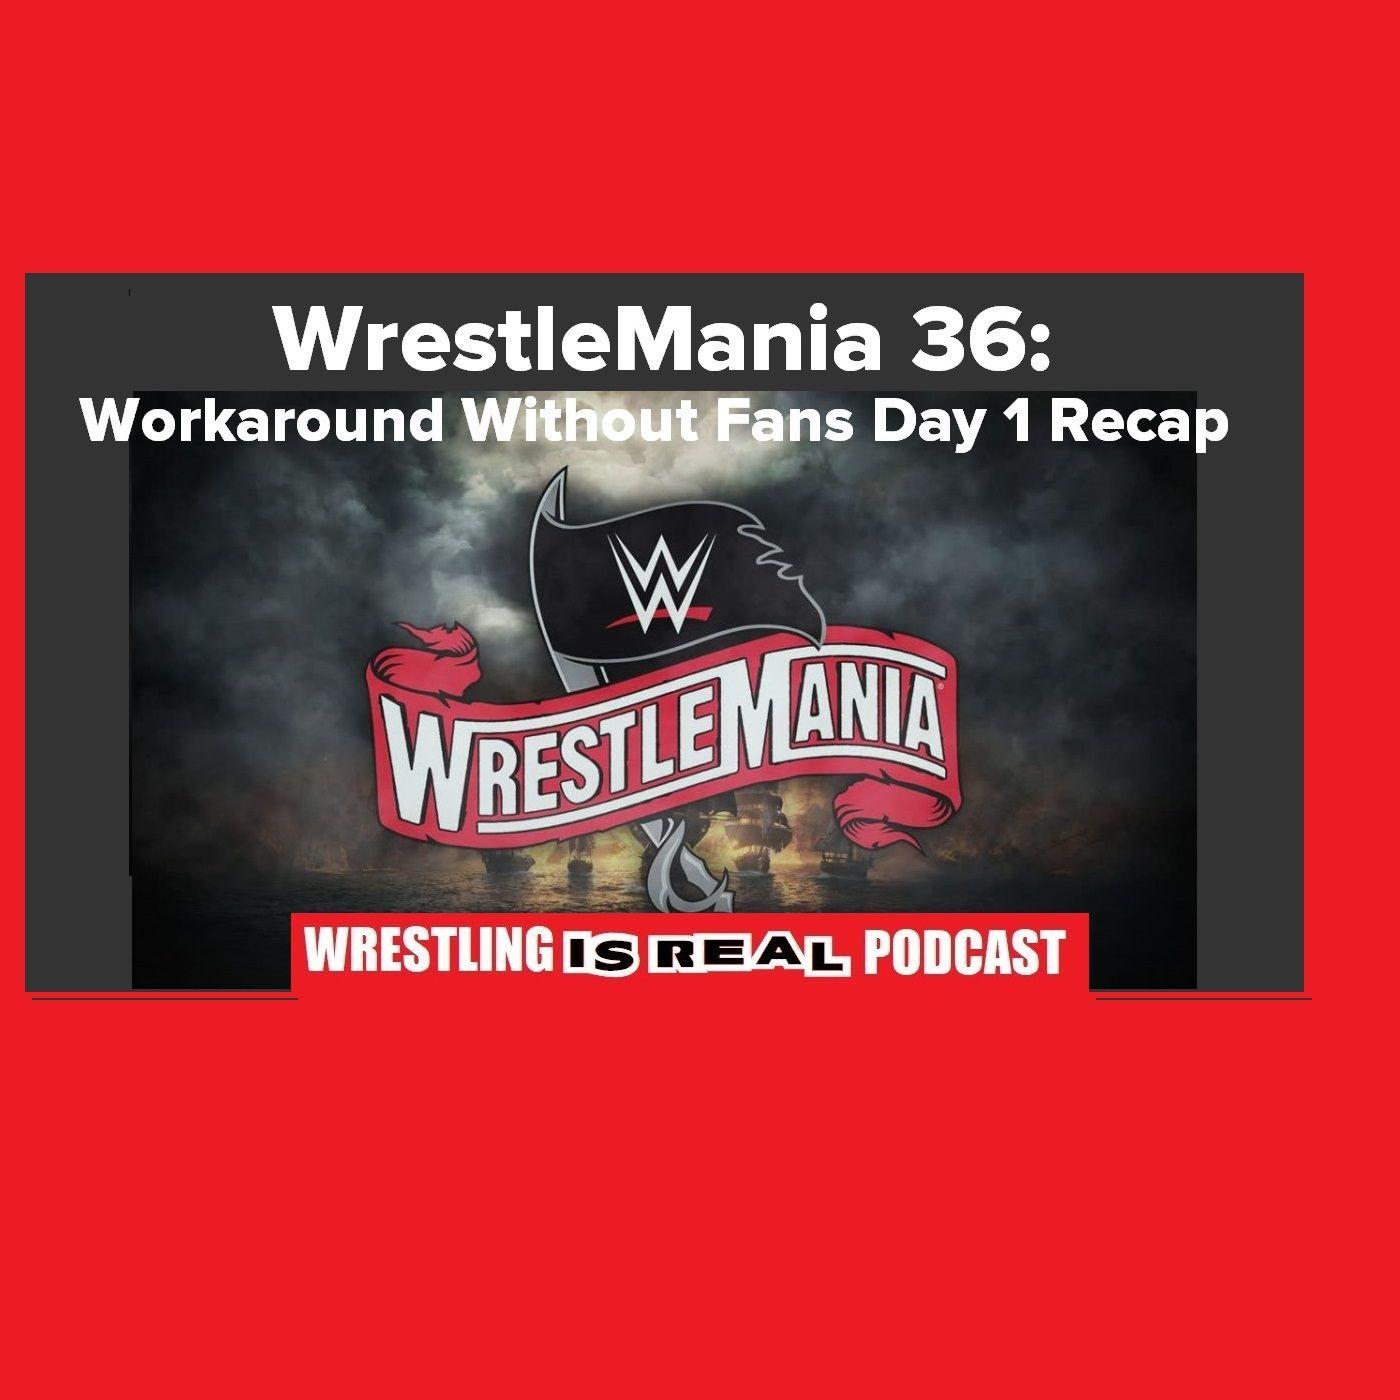 WrestleMania 36: Workaround Without Fans Day 1 Recap KOP040520-525